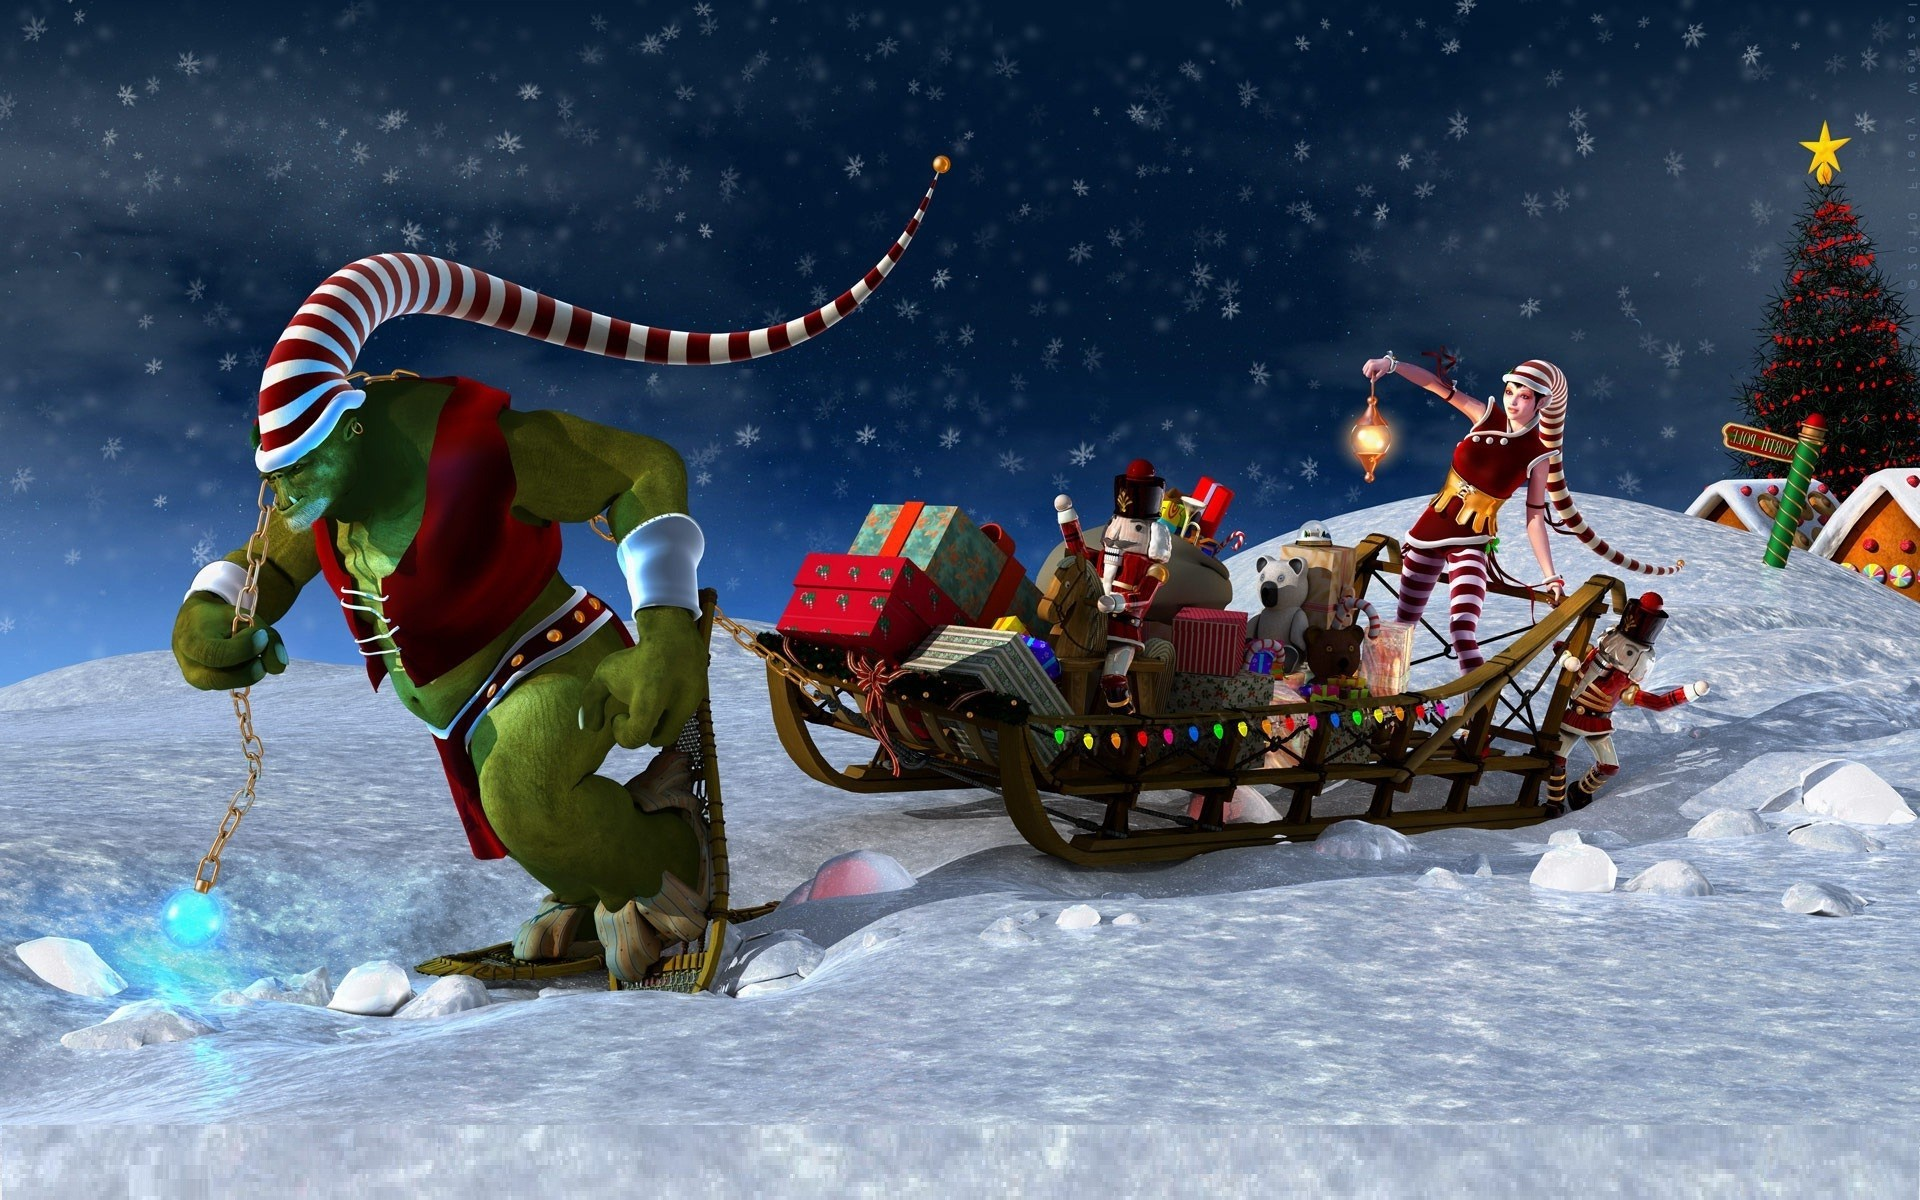 1920x1200 Animated Christmas Backgrounds For Desktop For Desktop